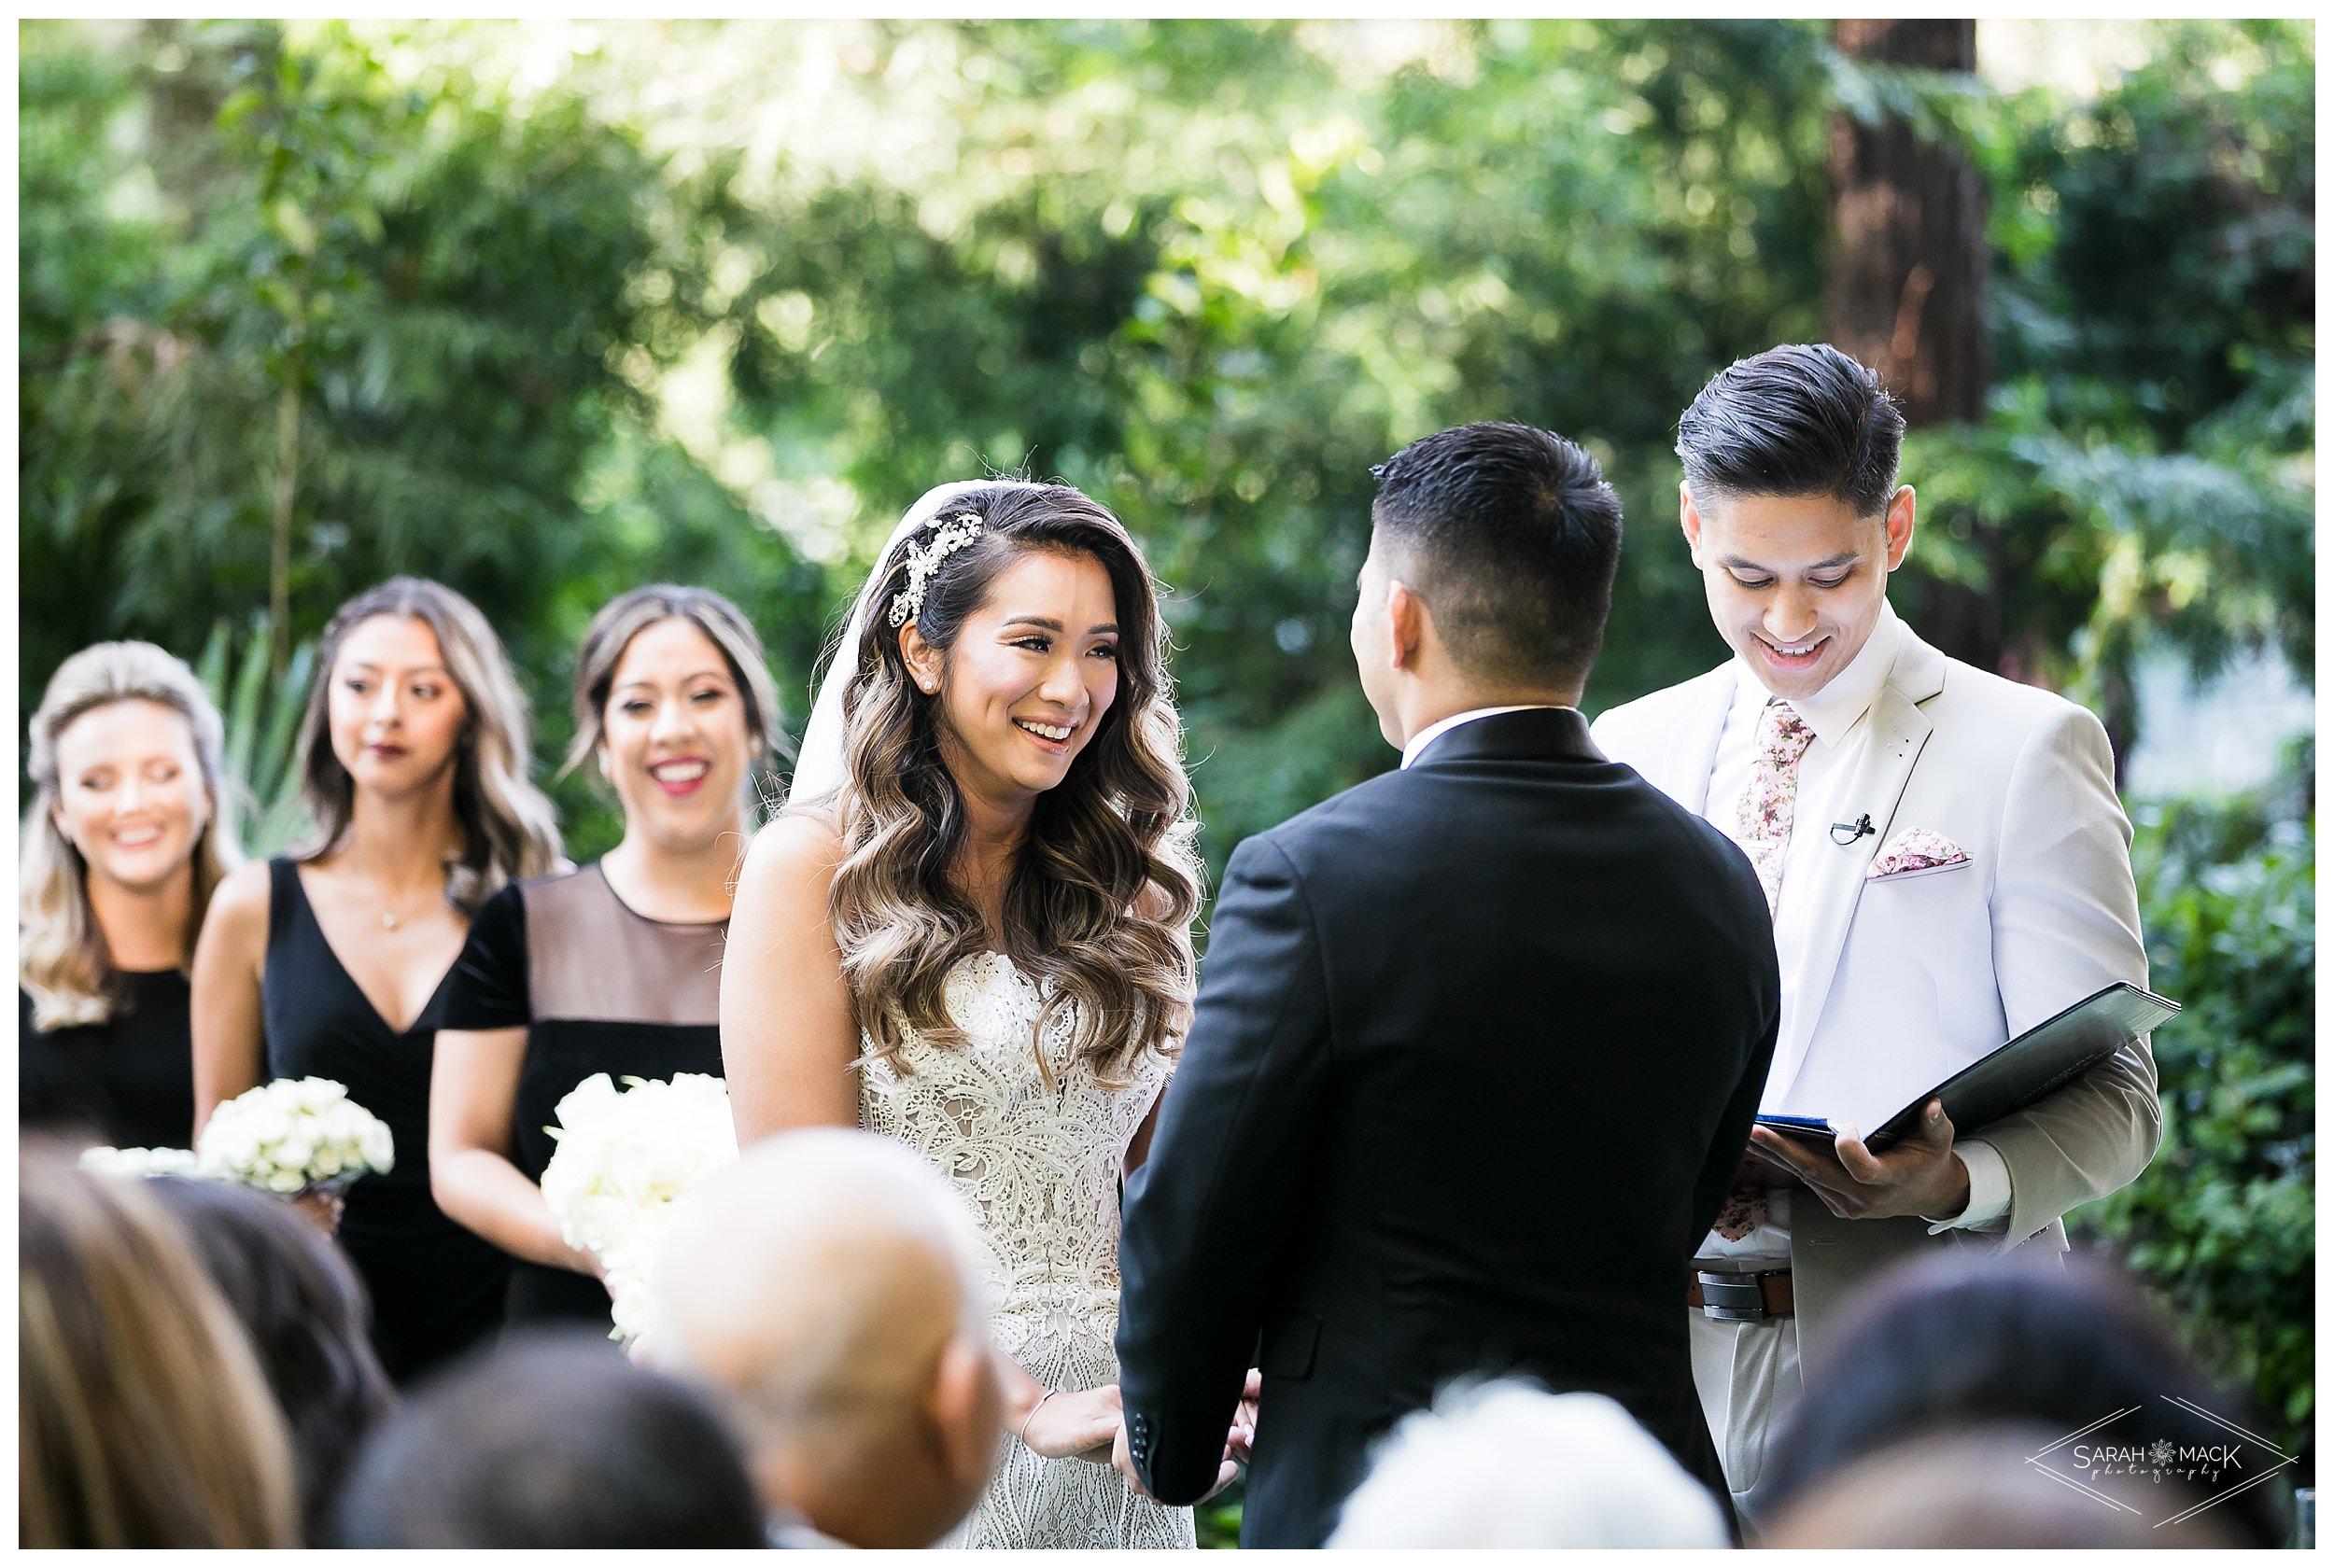 LE-Avenue-of-the-Arts-Costa-Mesa-Wedding-Photography-0150.jpg